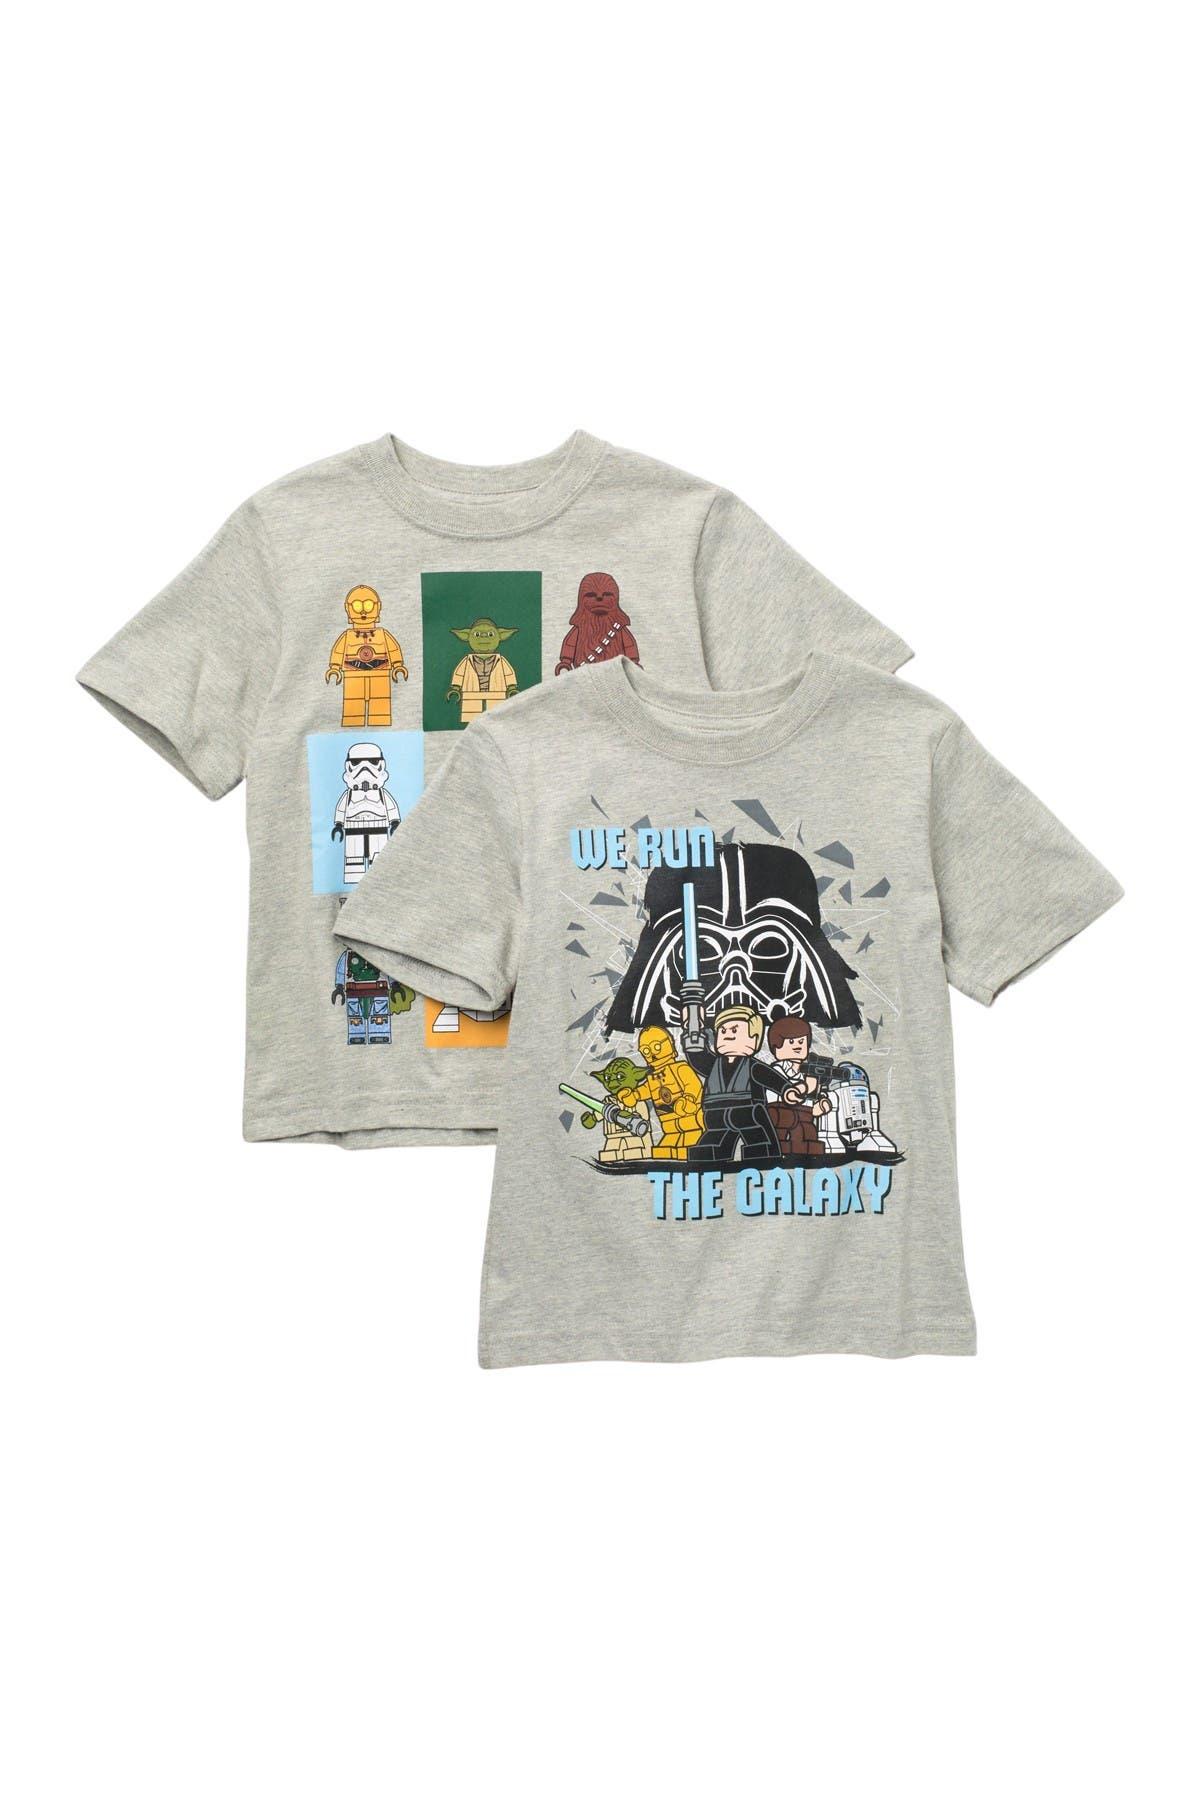 Friends Star wars Kid Tshirt Youth Shirt